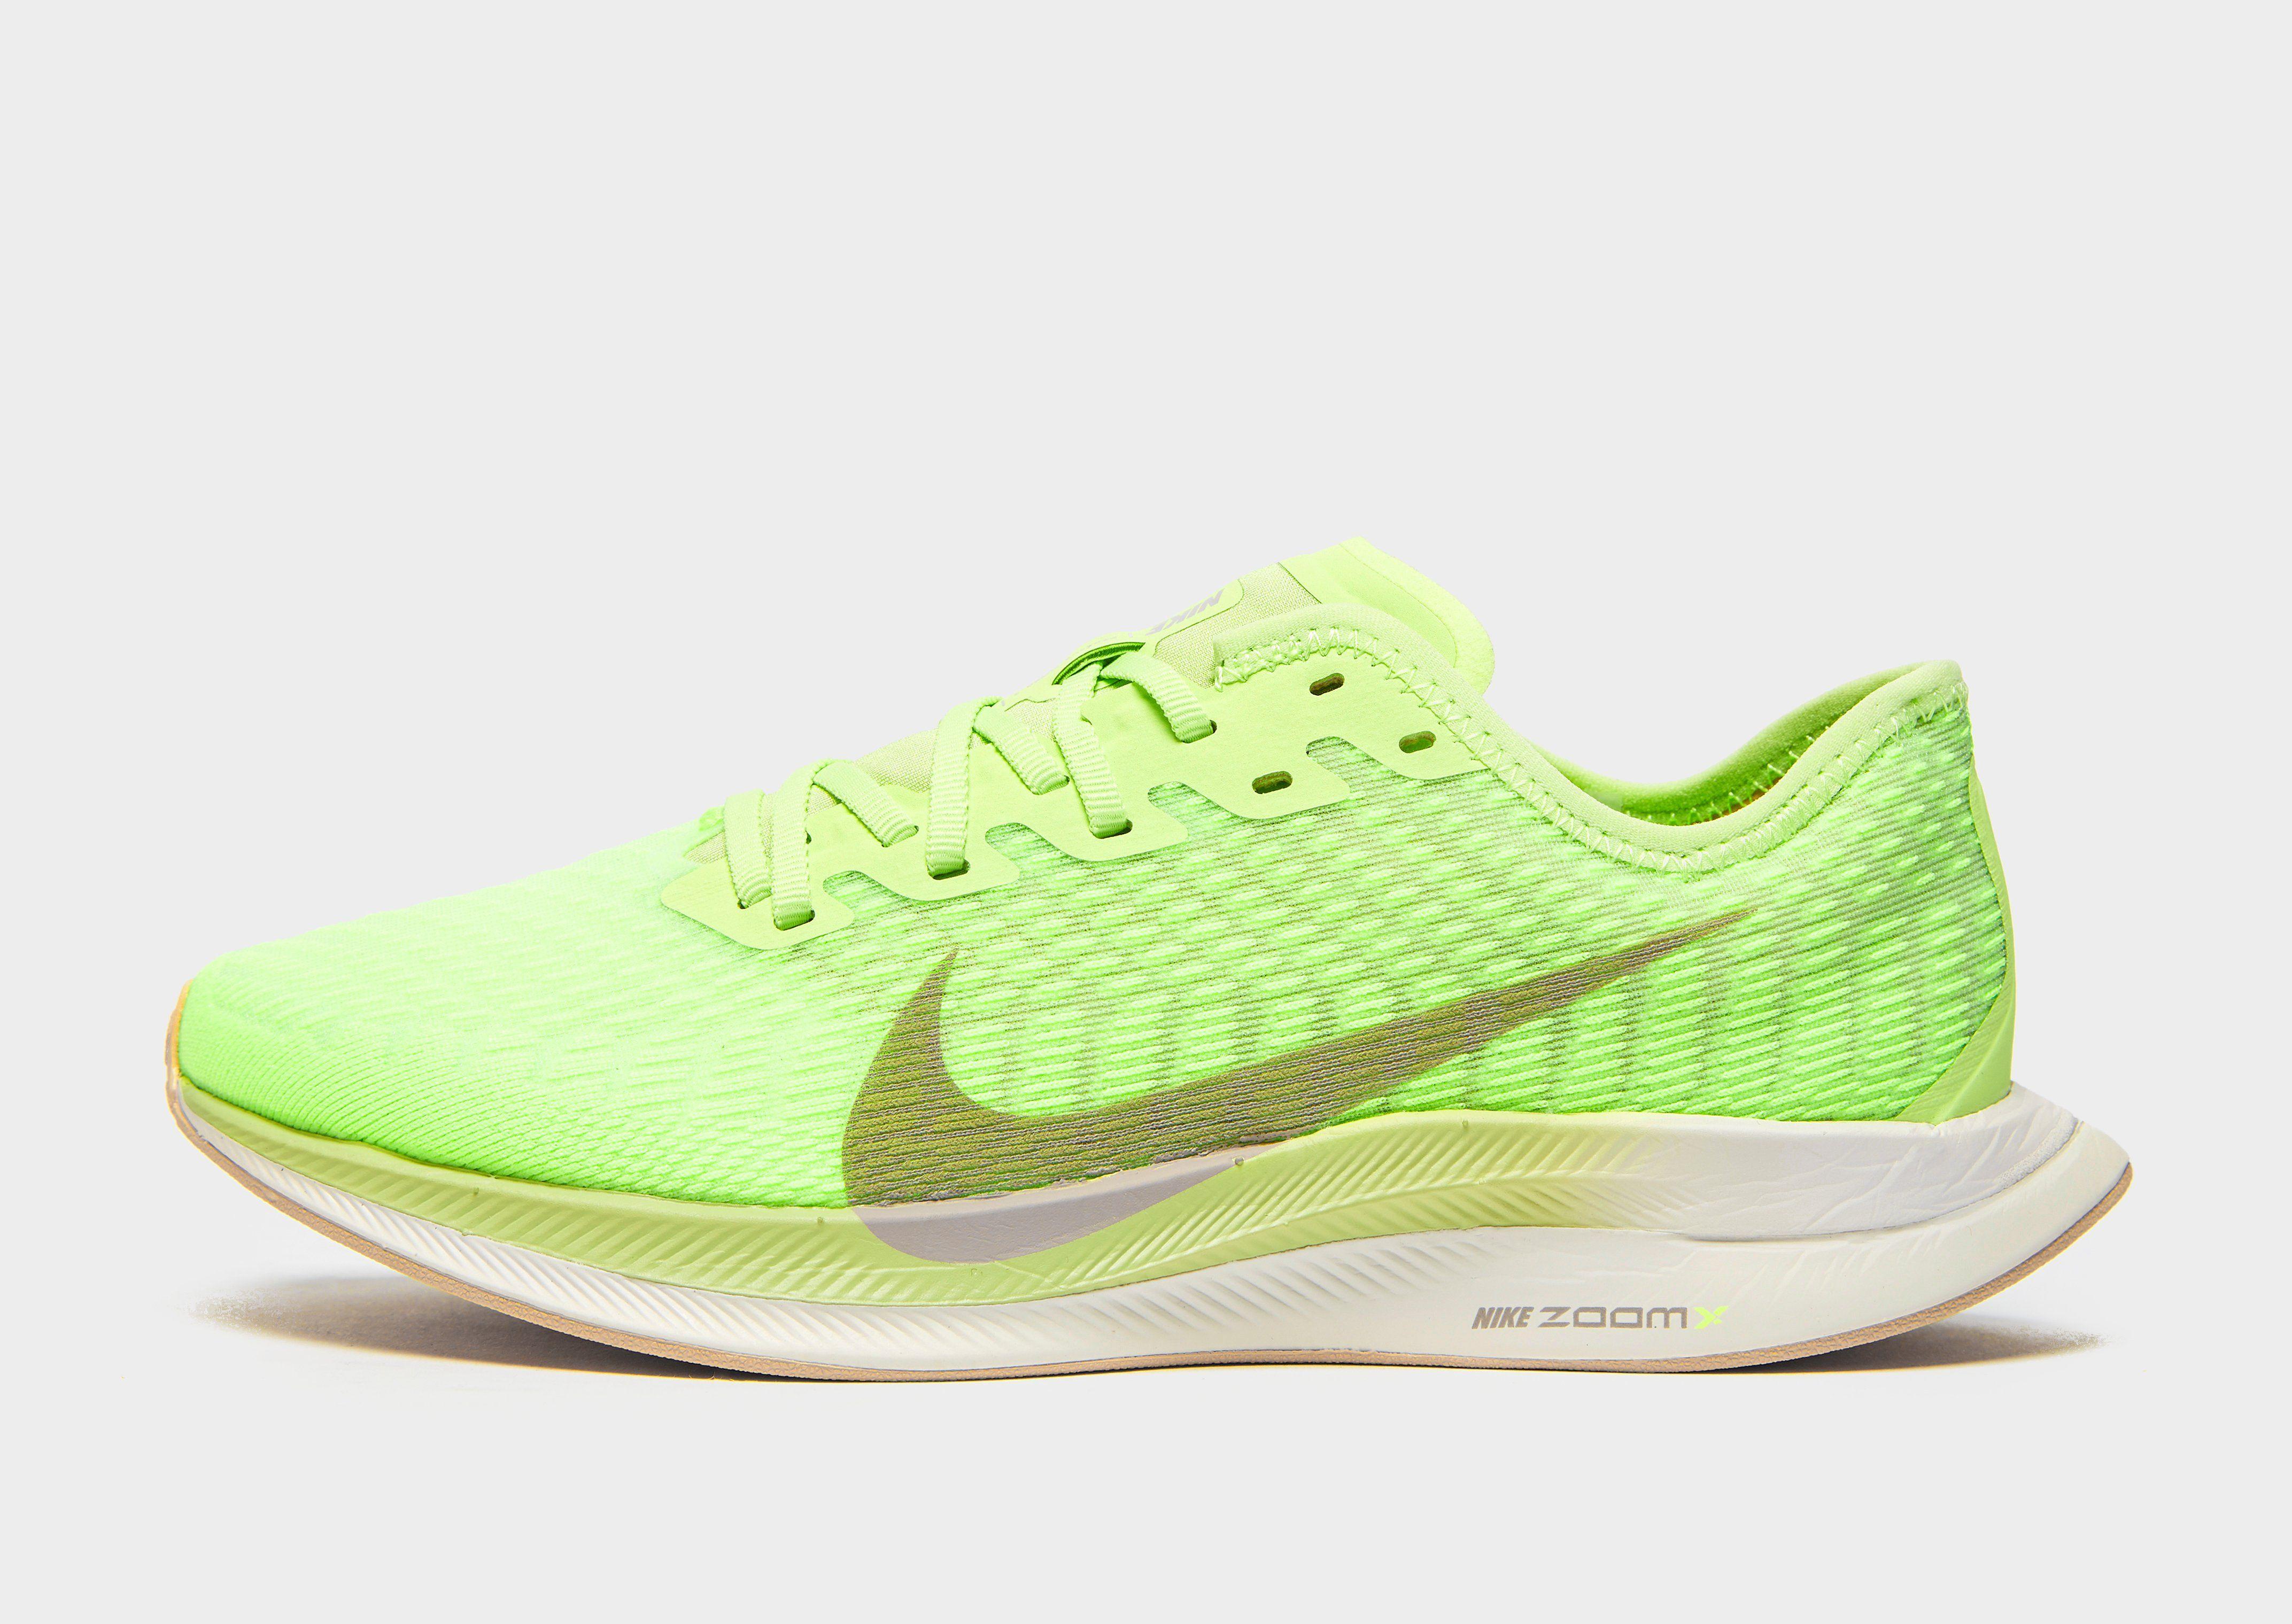 best service c2a07 80b38 Nike Zoom Pegasus Turbo 2 Women's Running Shoe | JD Sports